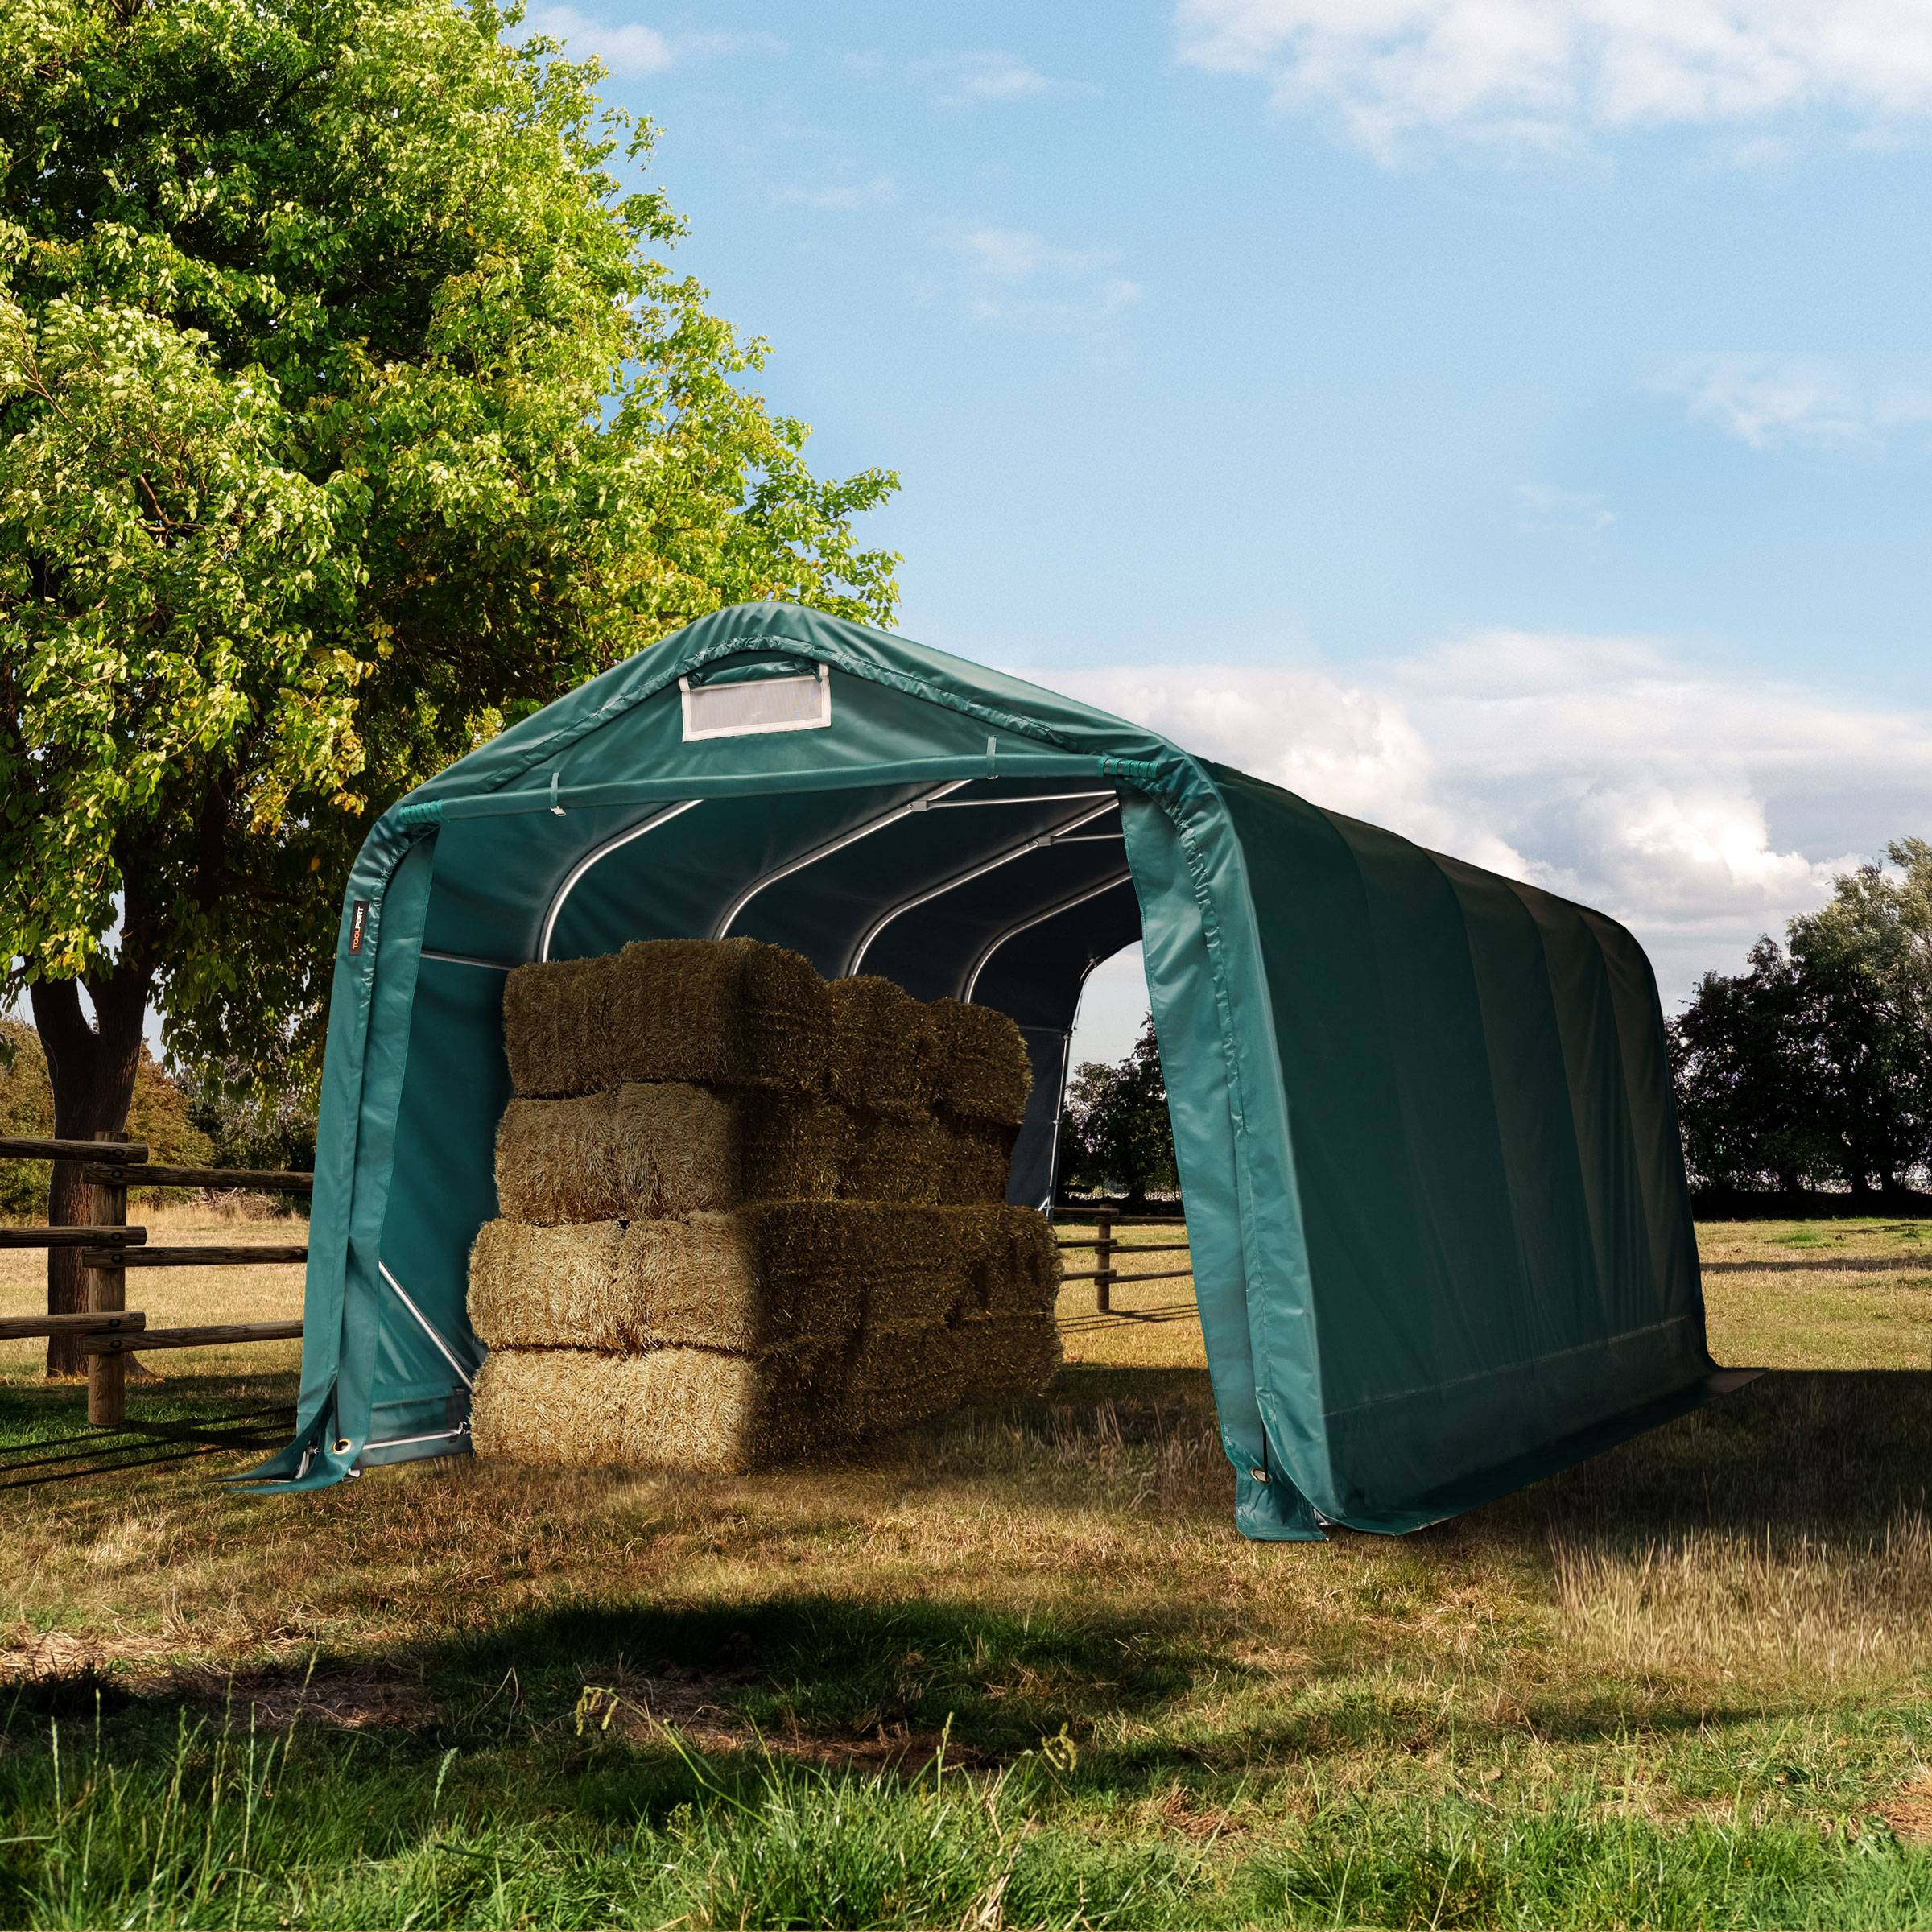 toolport box cavalli 3,3x6,0m pvc 550 g/m² verde sì